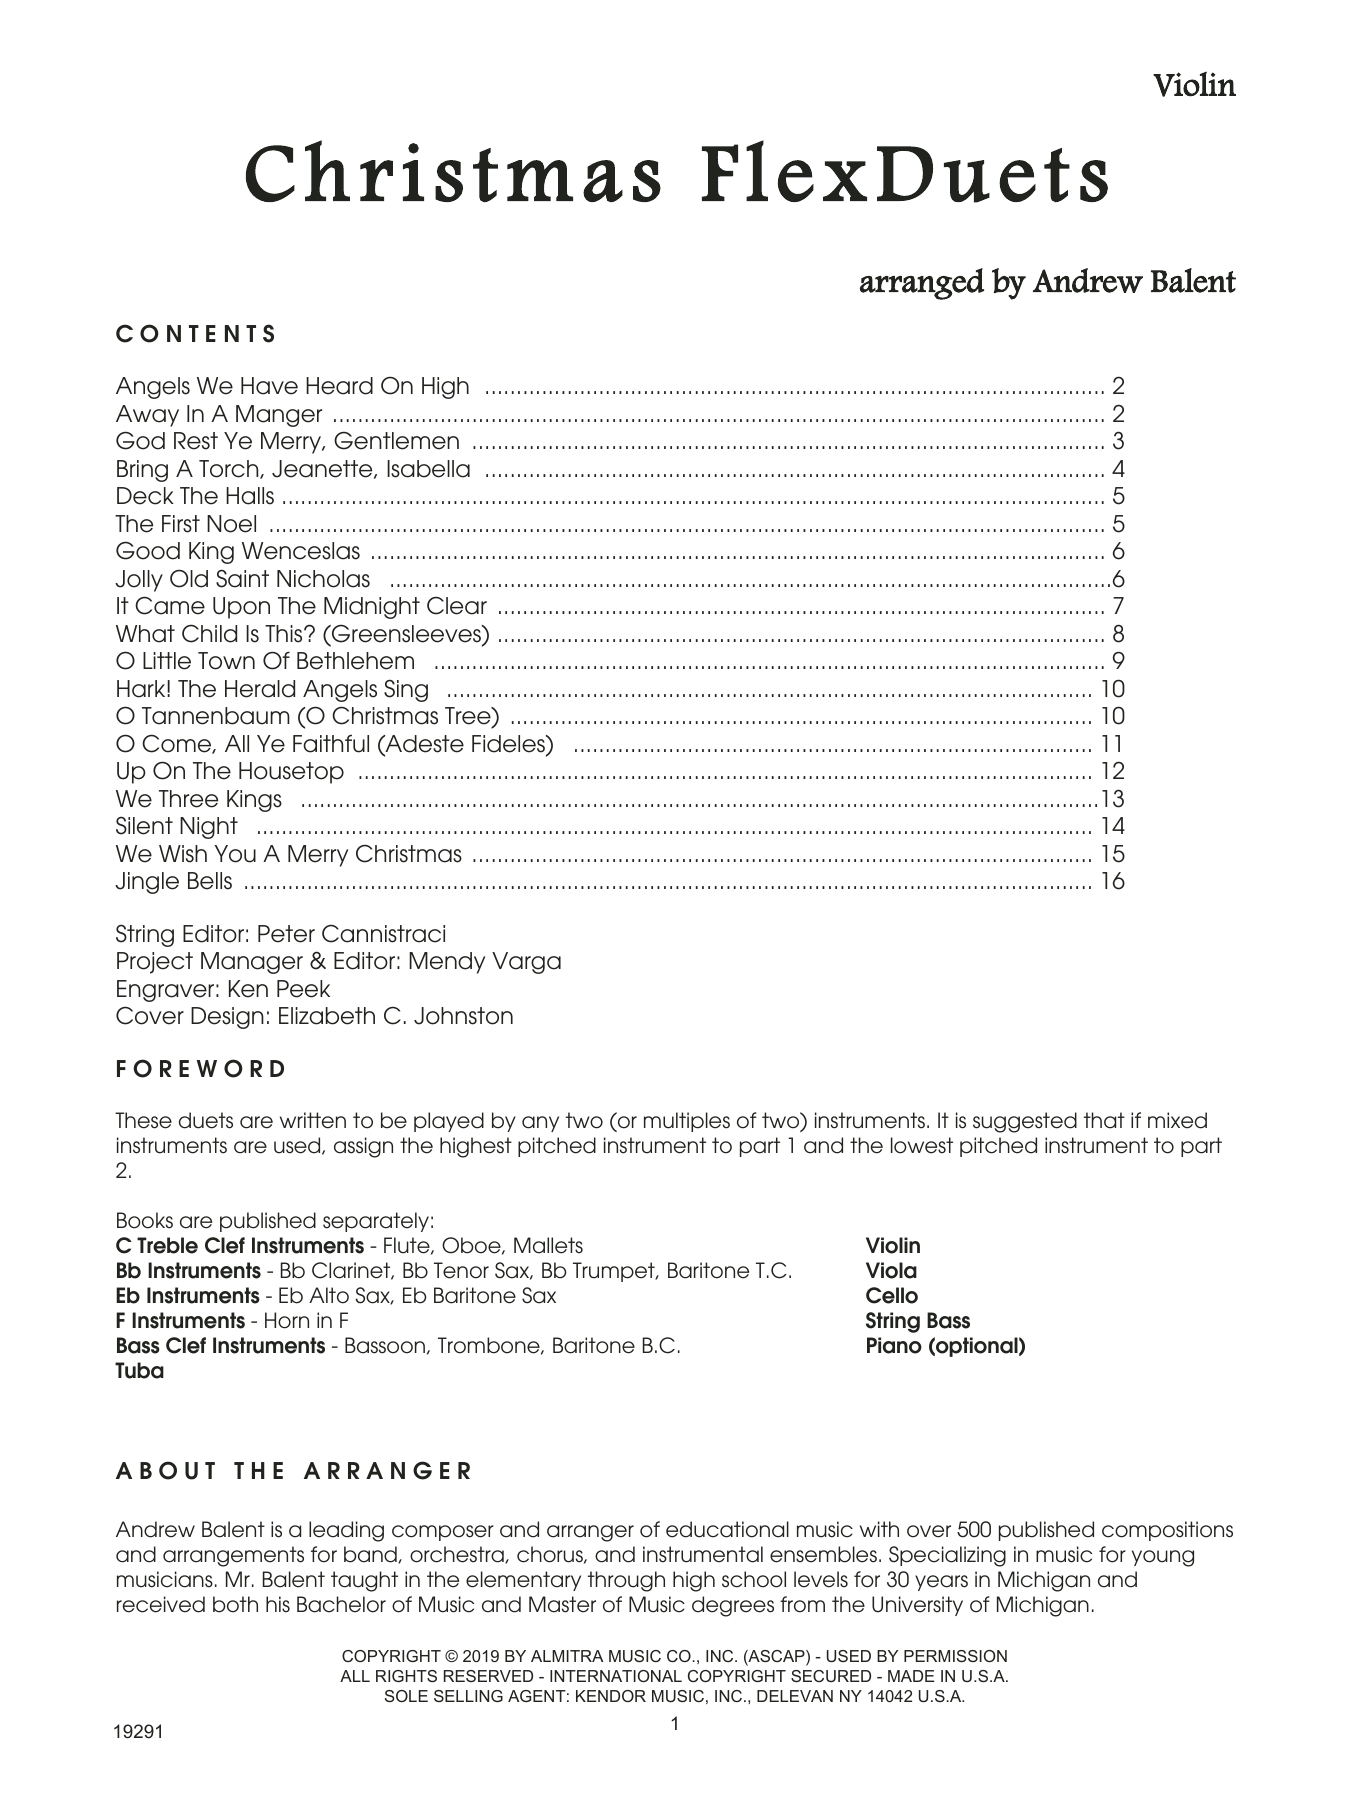 Andrew Balent Christmas Flexduets - Violin sheet music notes and chords. Download Printable PDF.